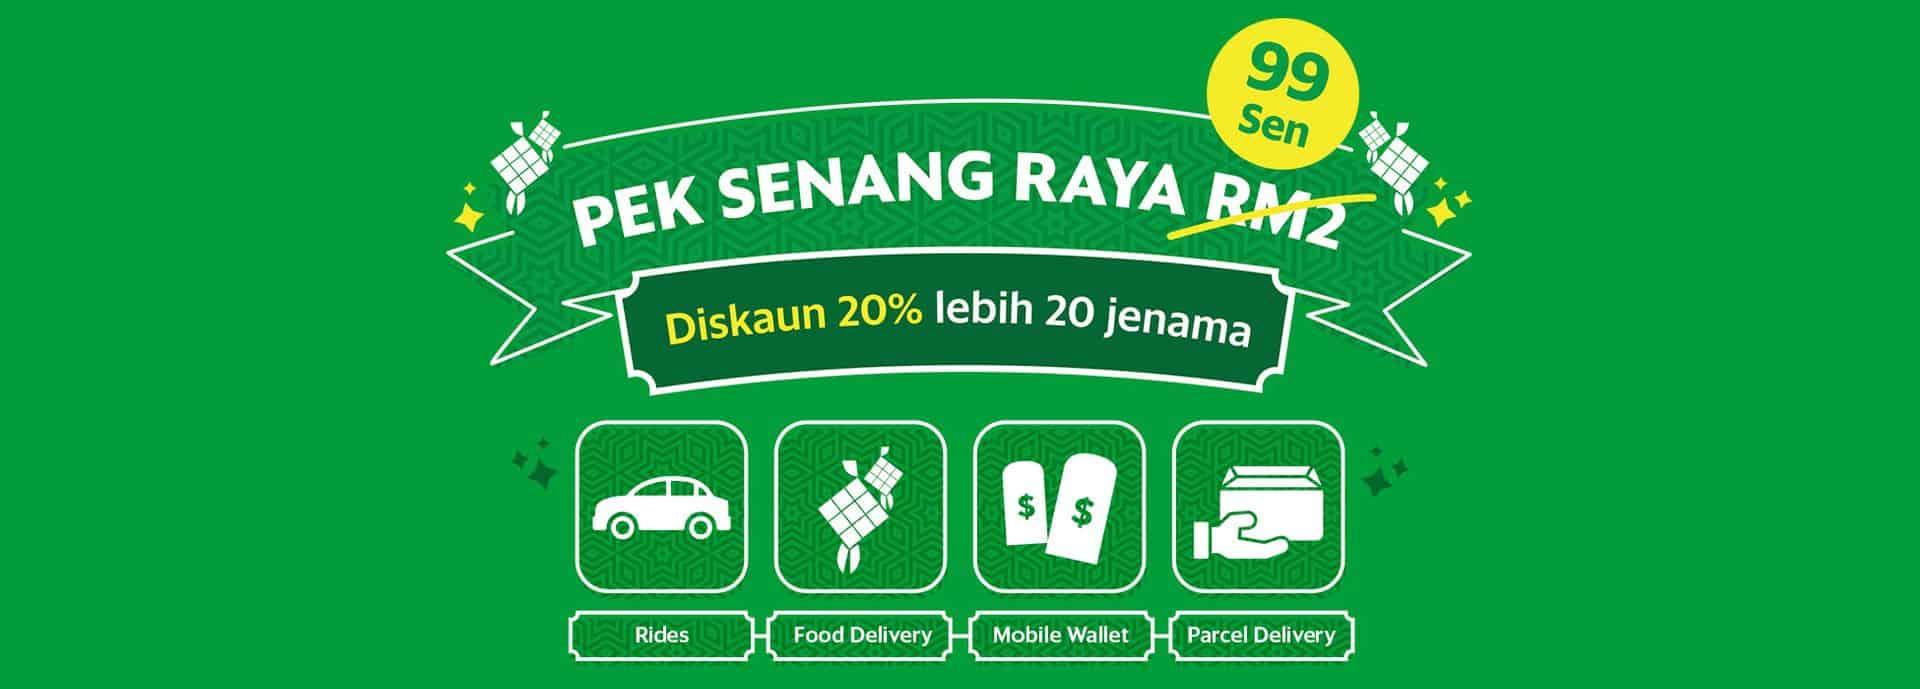 Senang Raya Jimat RM600 dengan Rm2 - Rides . Food Delivery . Mobile Wallet .  Parcel Delivery